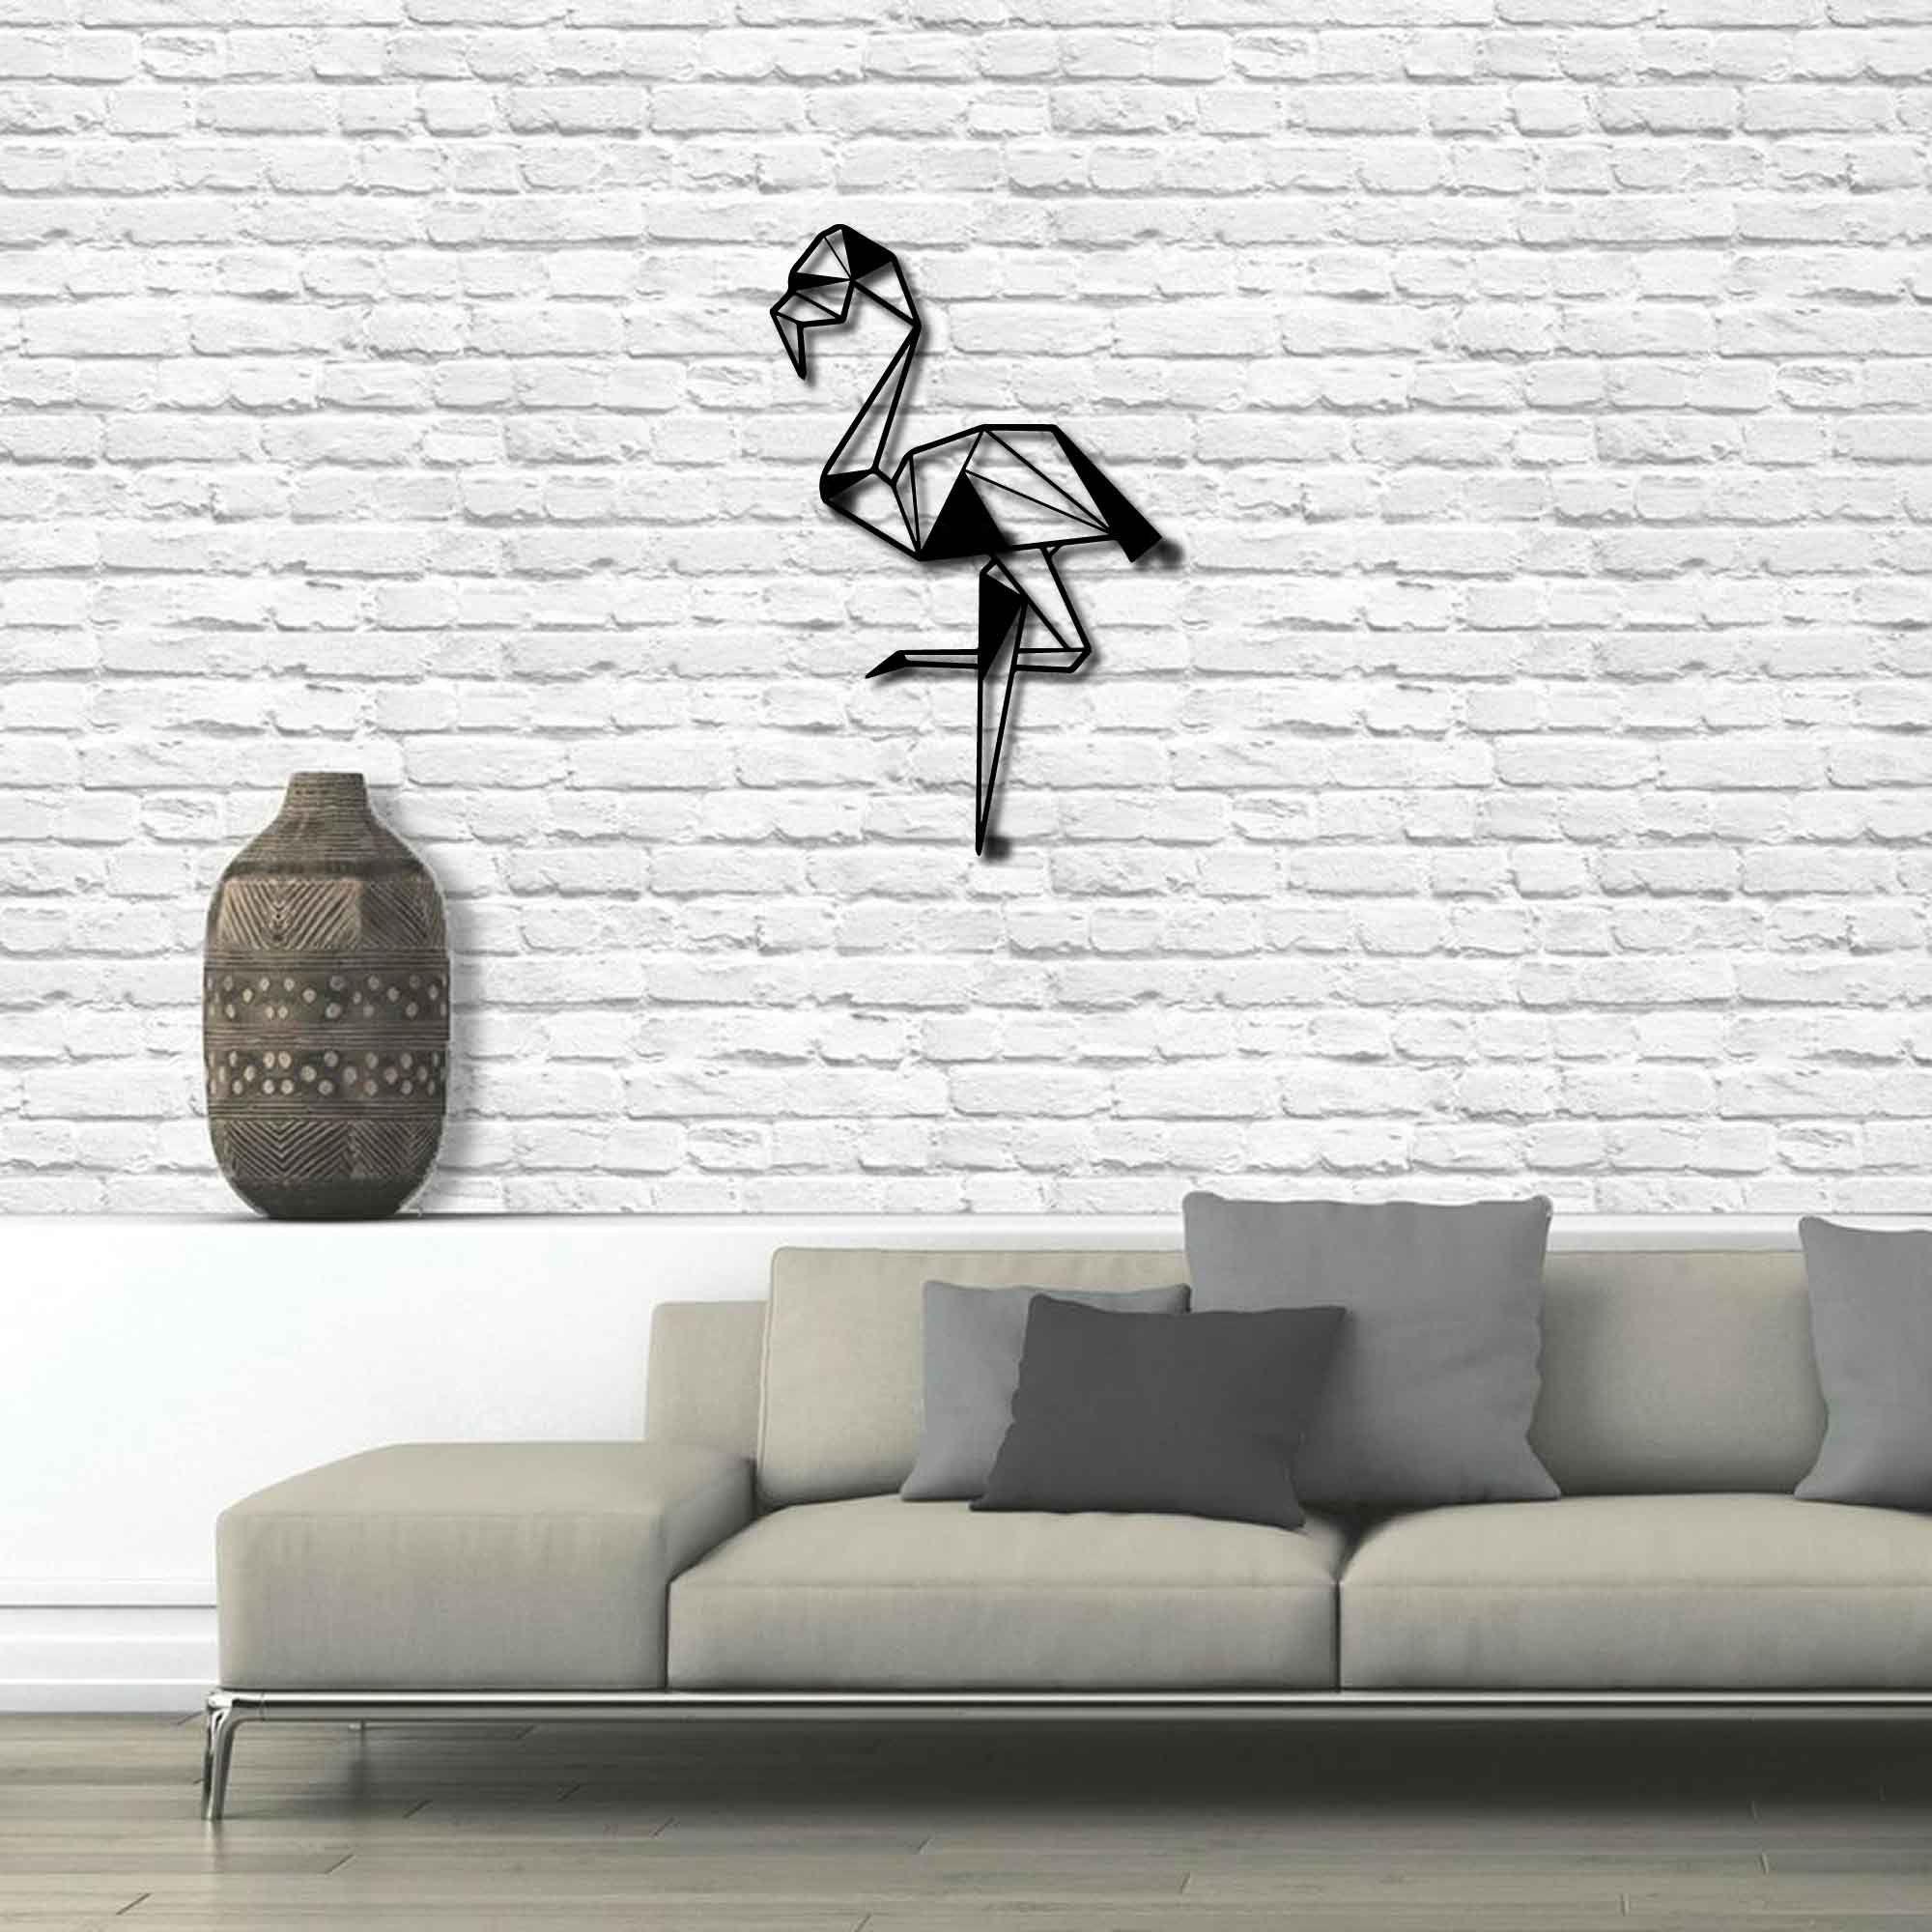 Metal Wall Art Flamingo Interior Decoration Home Decor Etsy Flamingo Interior Geometric Wall Decor Metal Wall Art